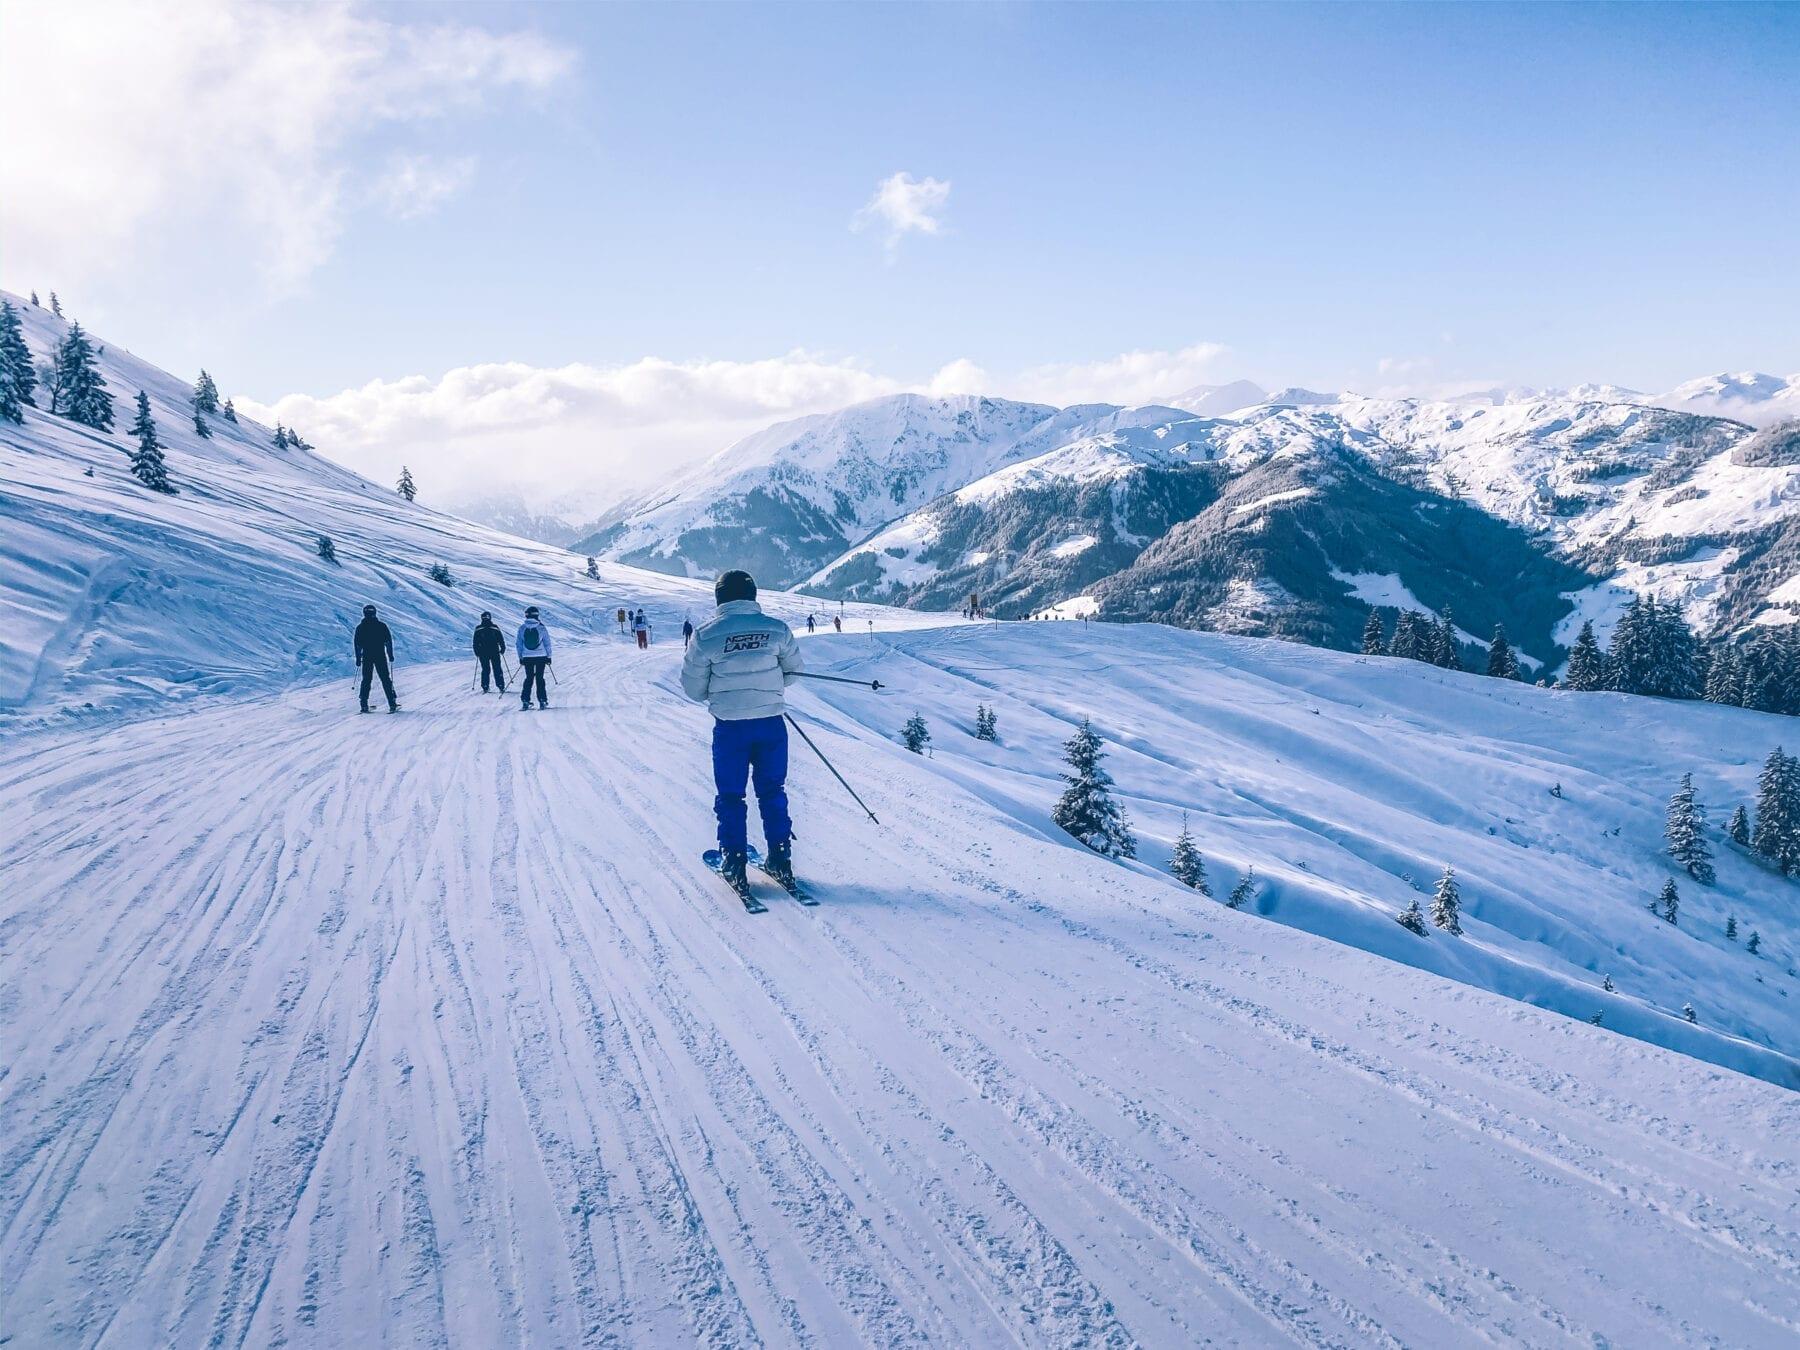 SkiWelt Hopfgarten